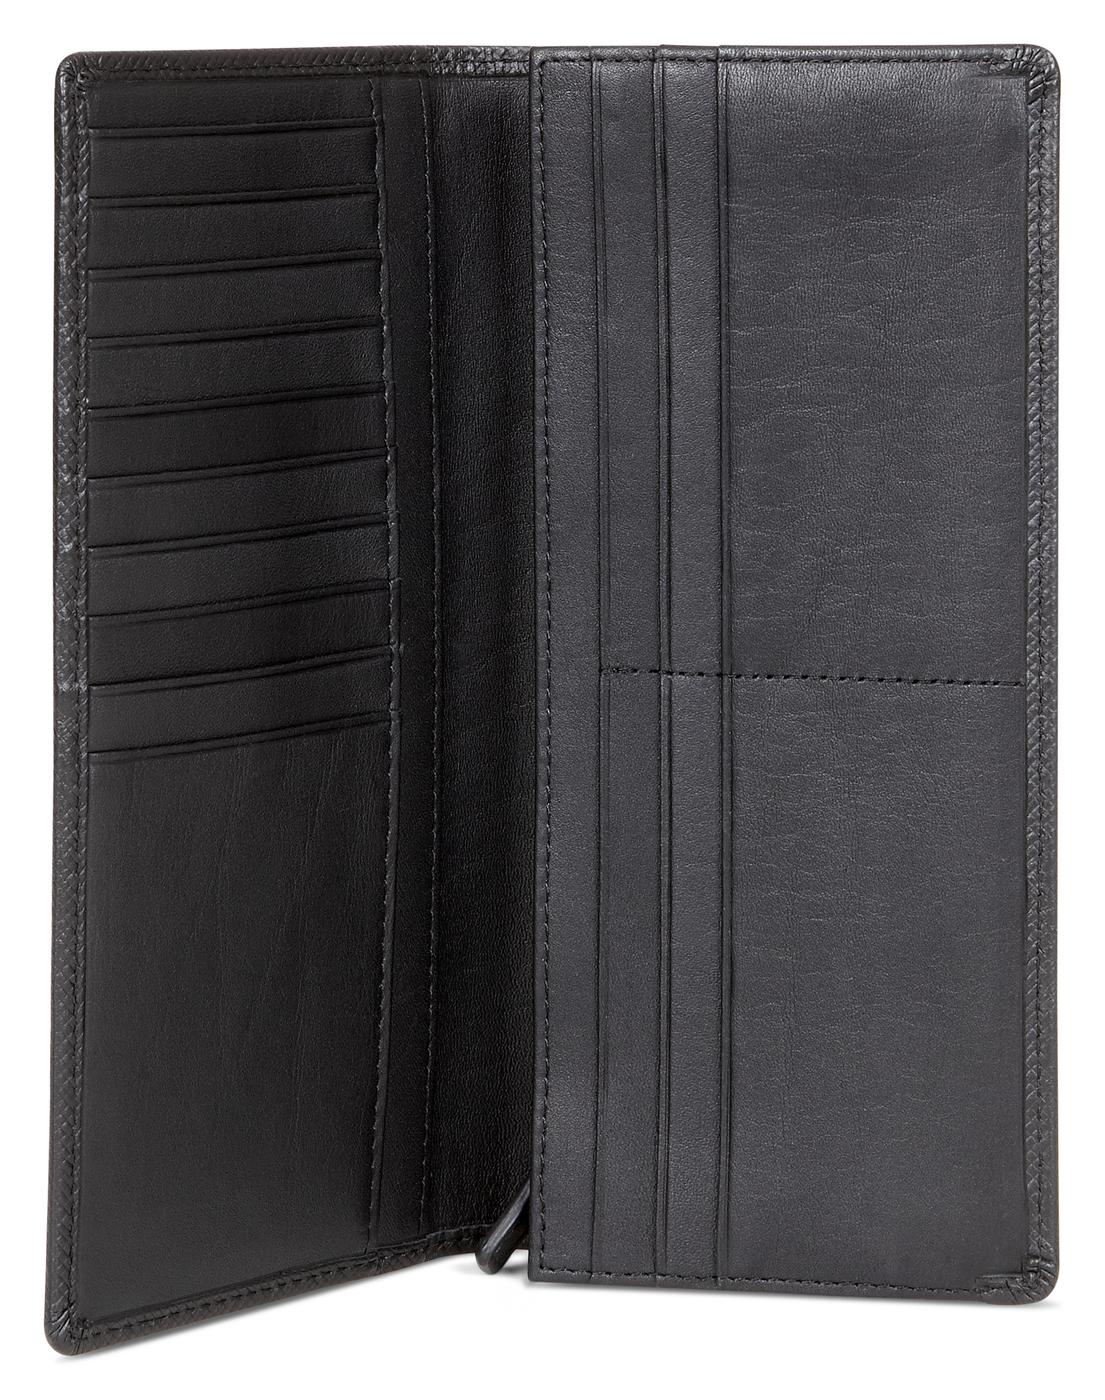 ECCO Glenn Continental Wallet